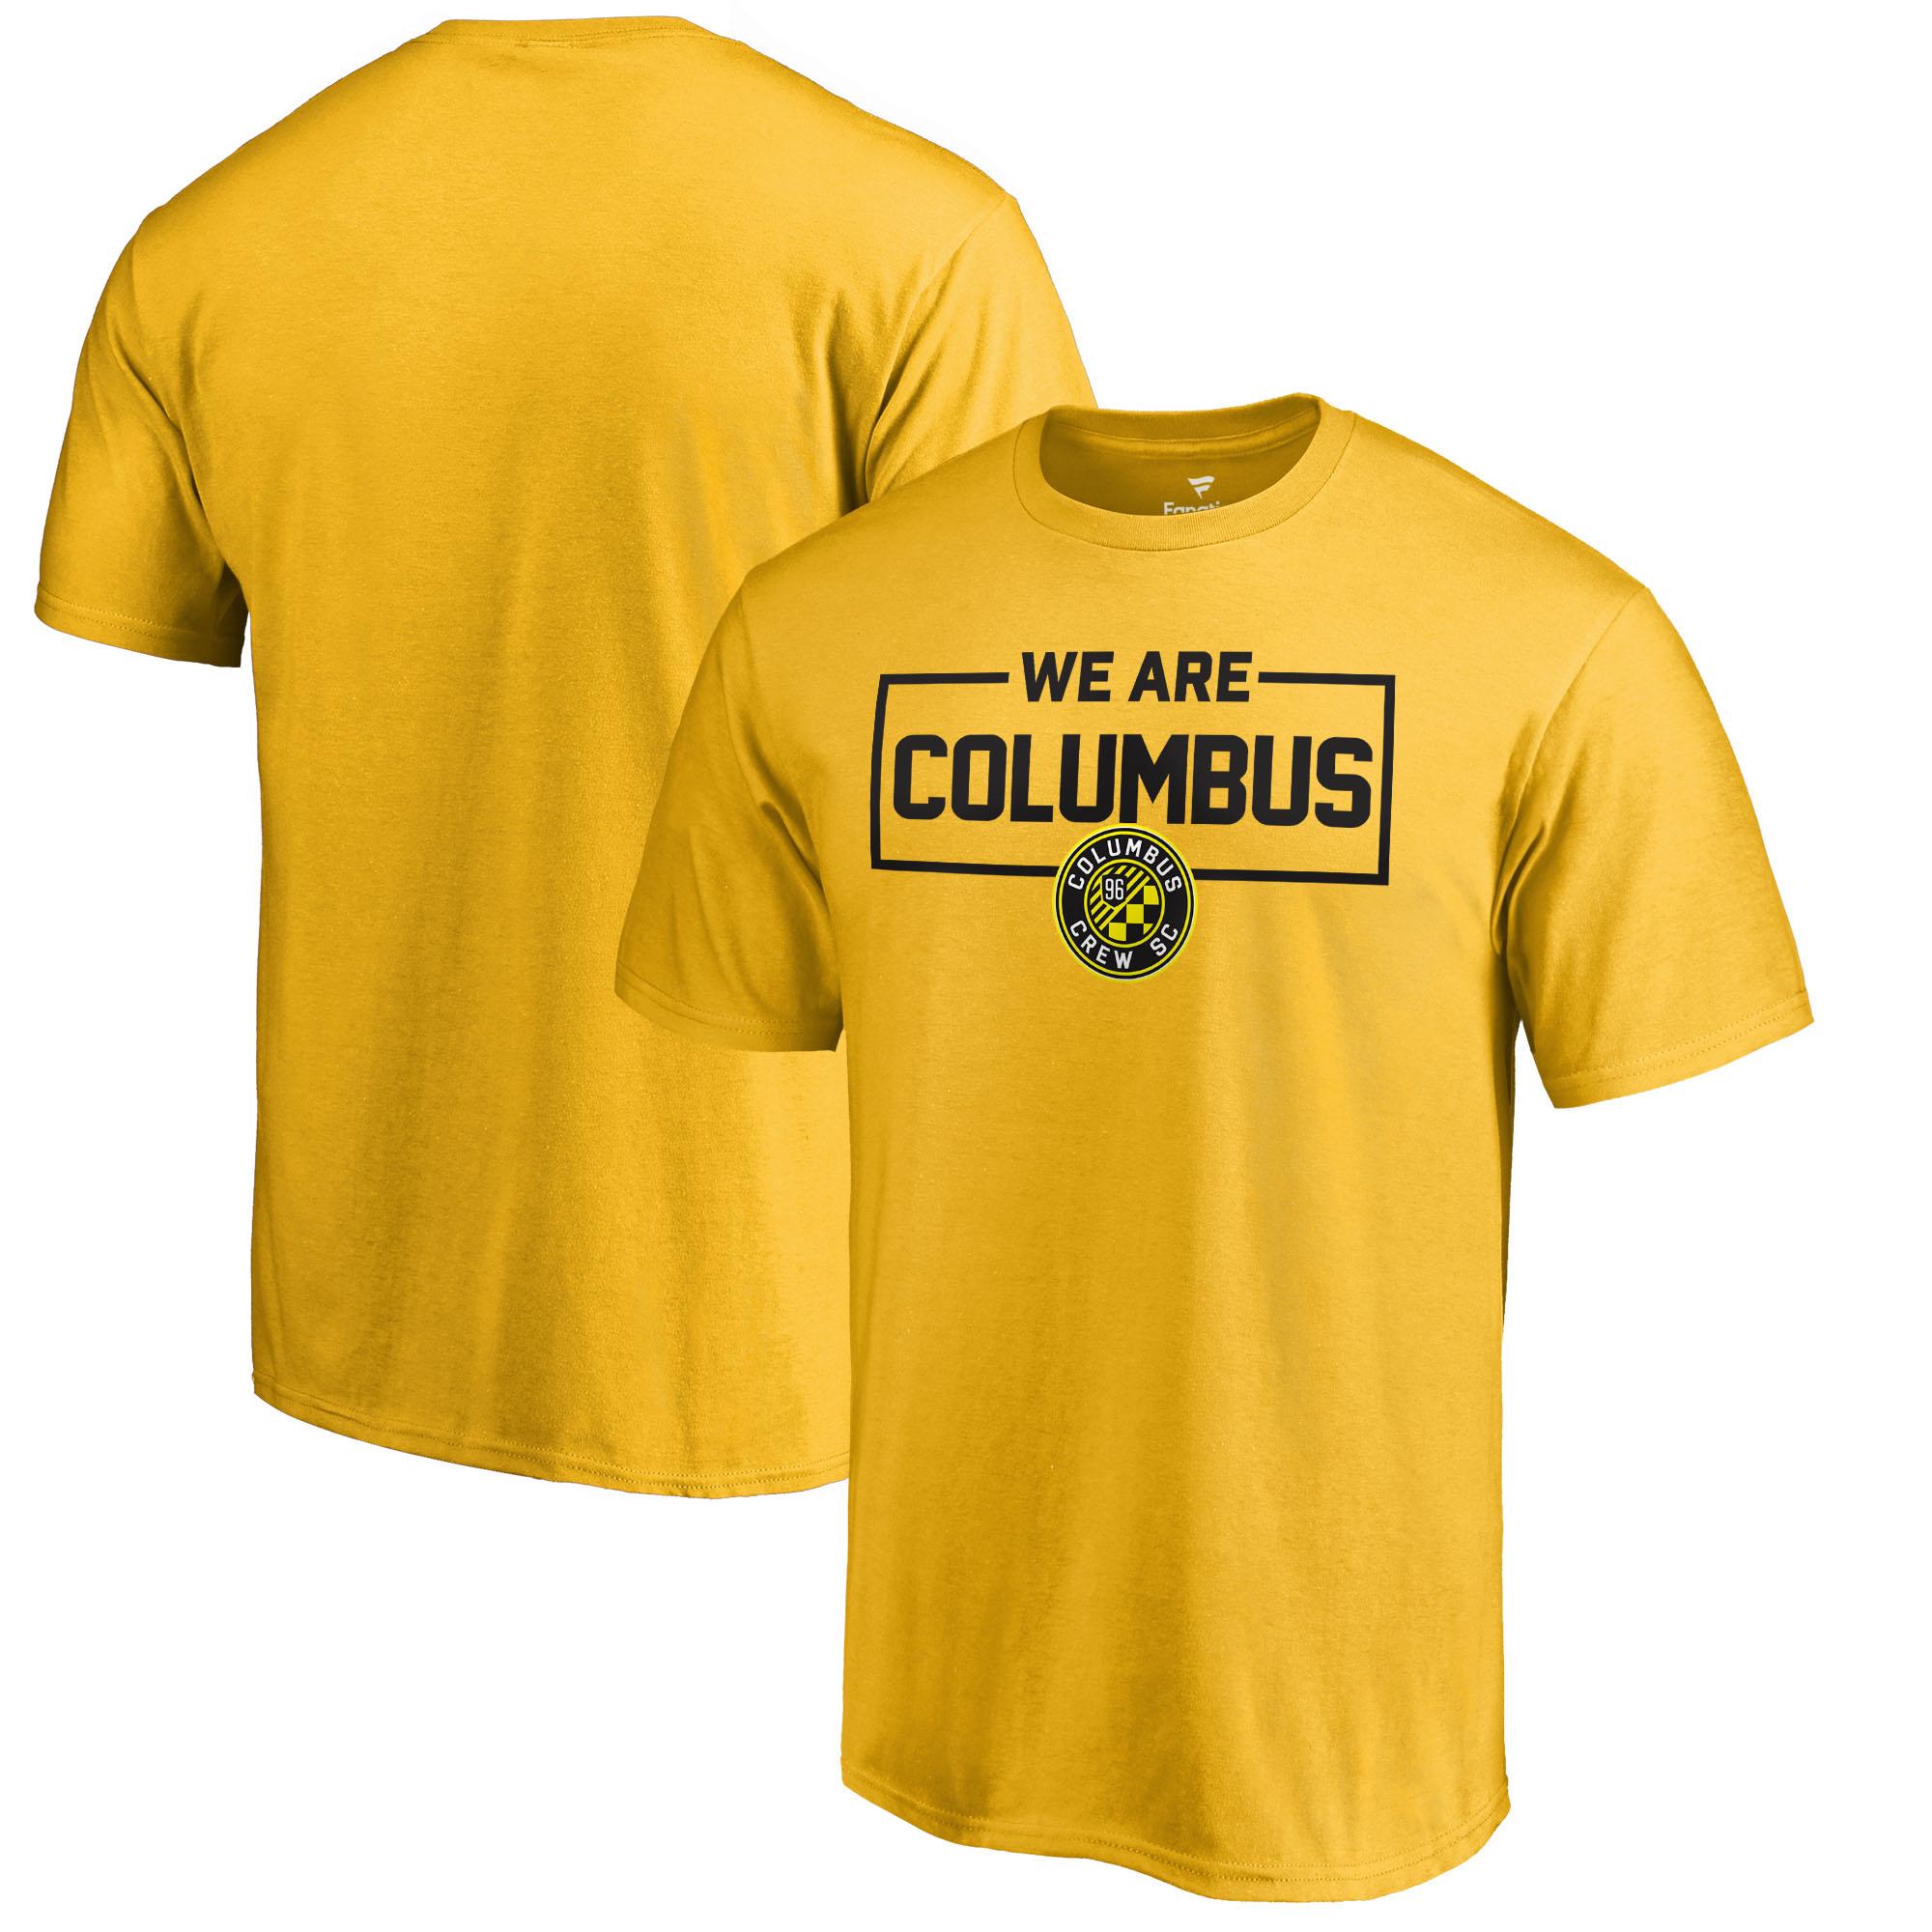 Columbus Crew SC Fanatics Branded We Are T-Shirt - Yellow